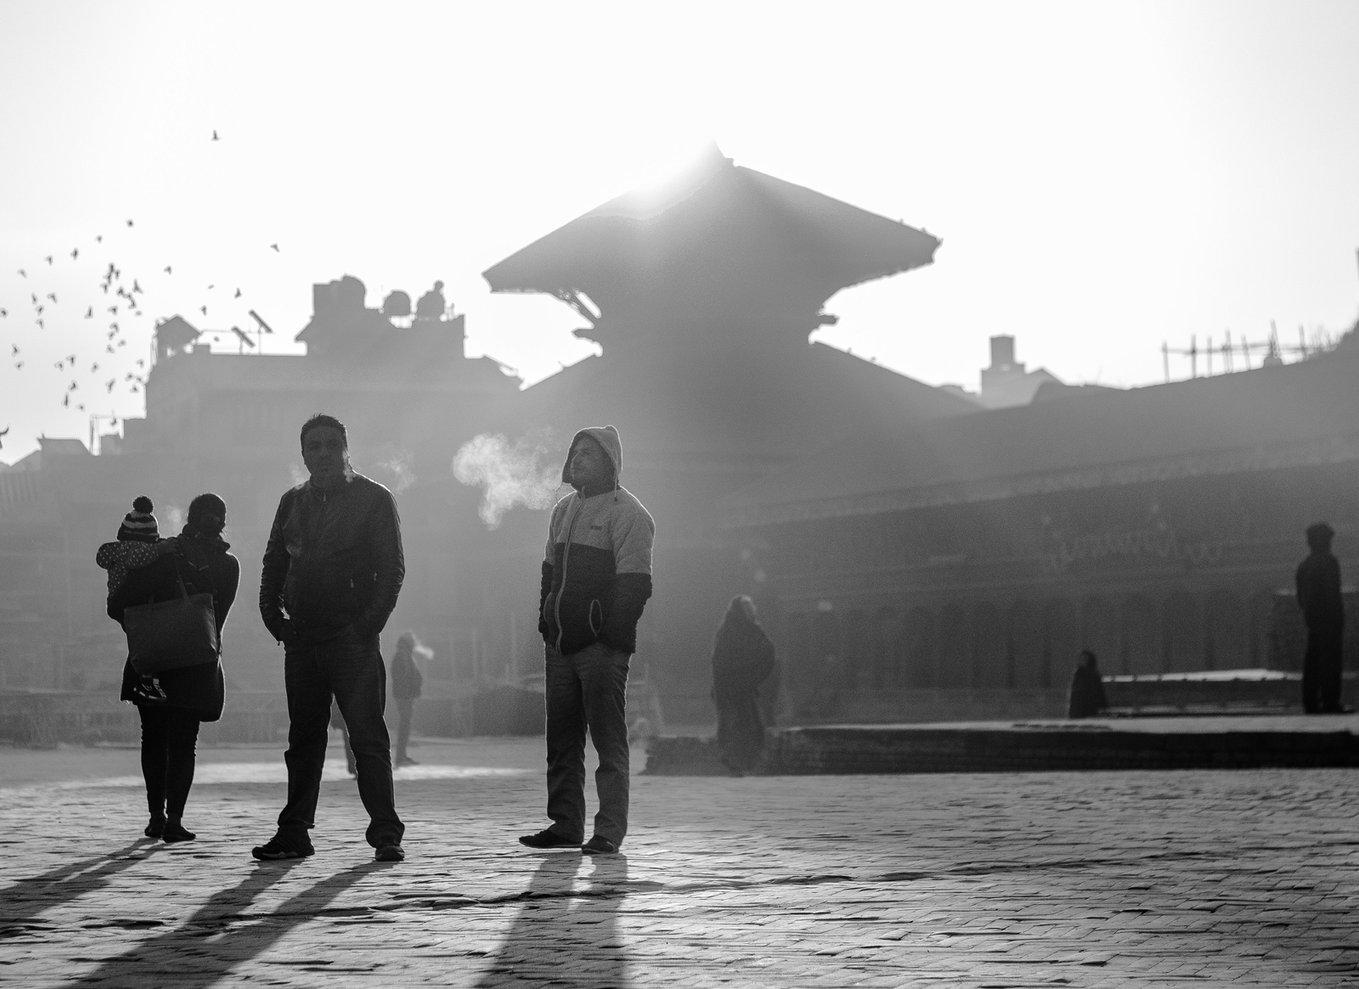 Amanecer en Kathmandu - Sunrise